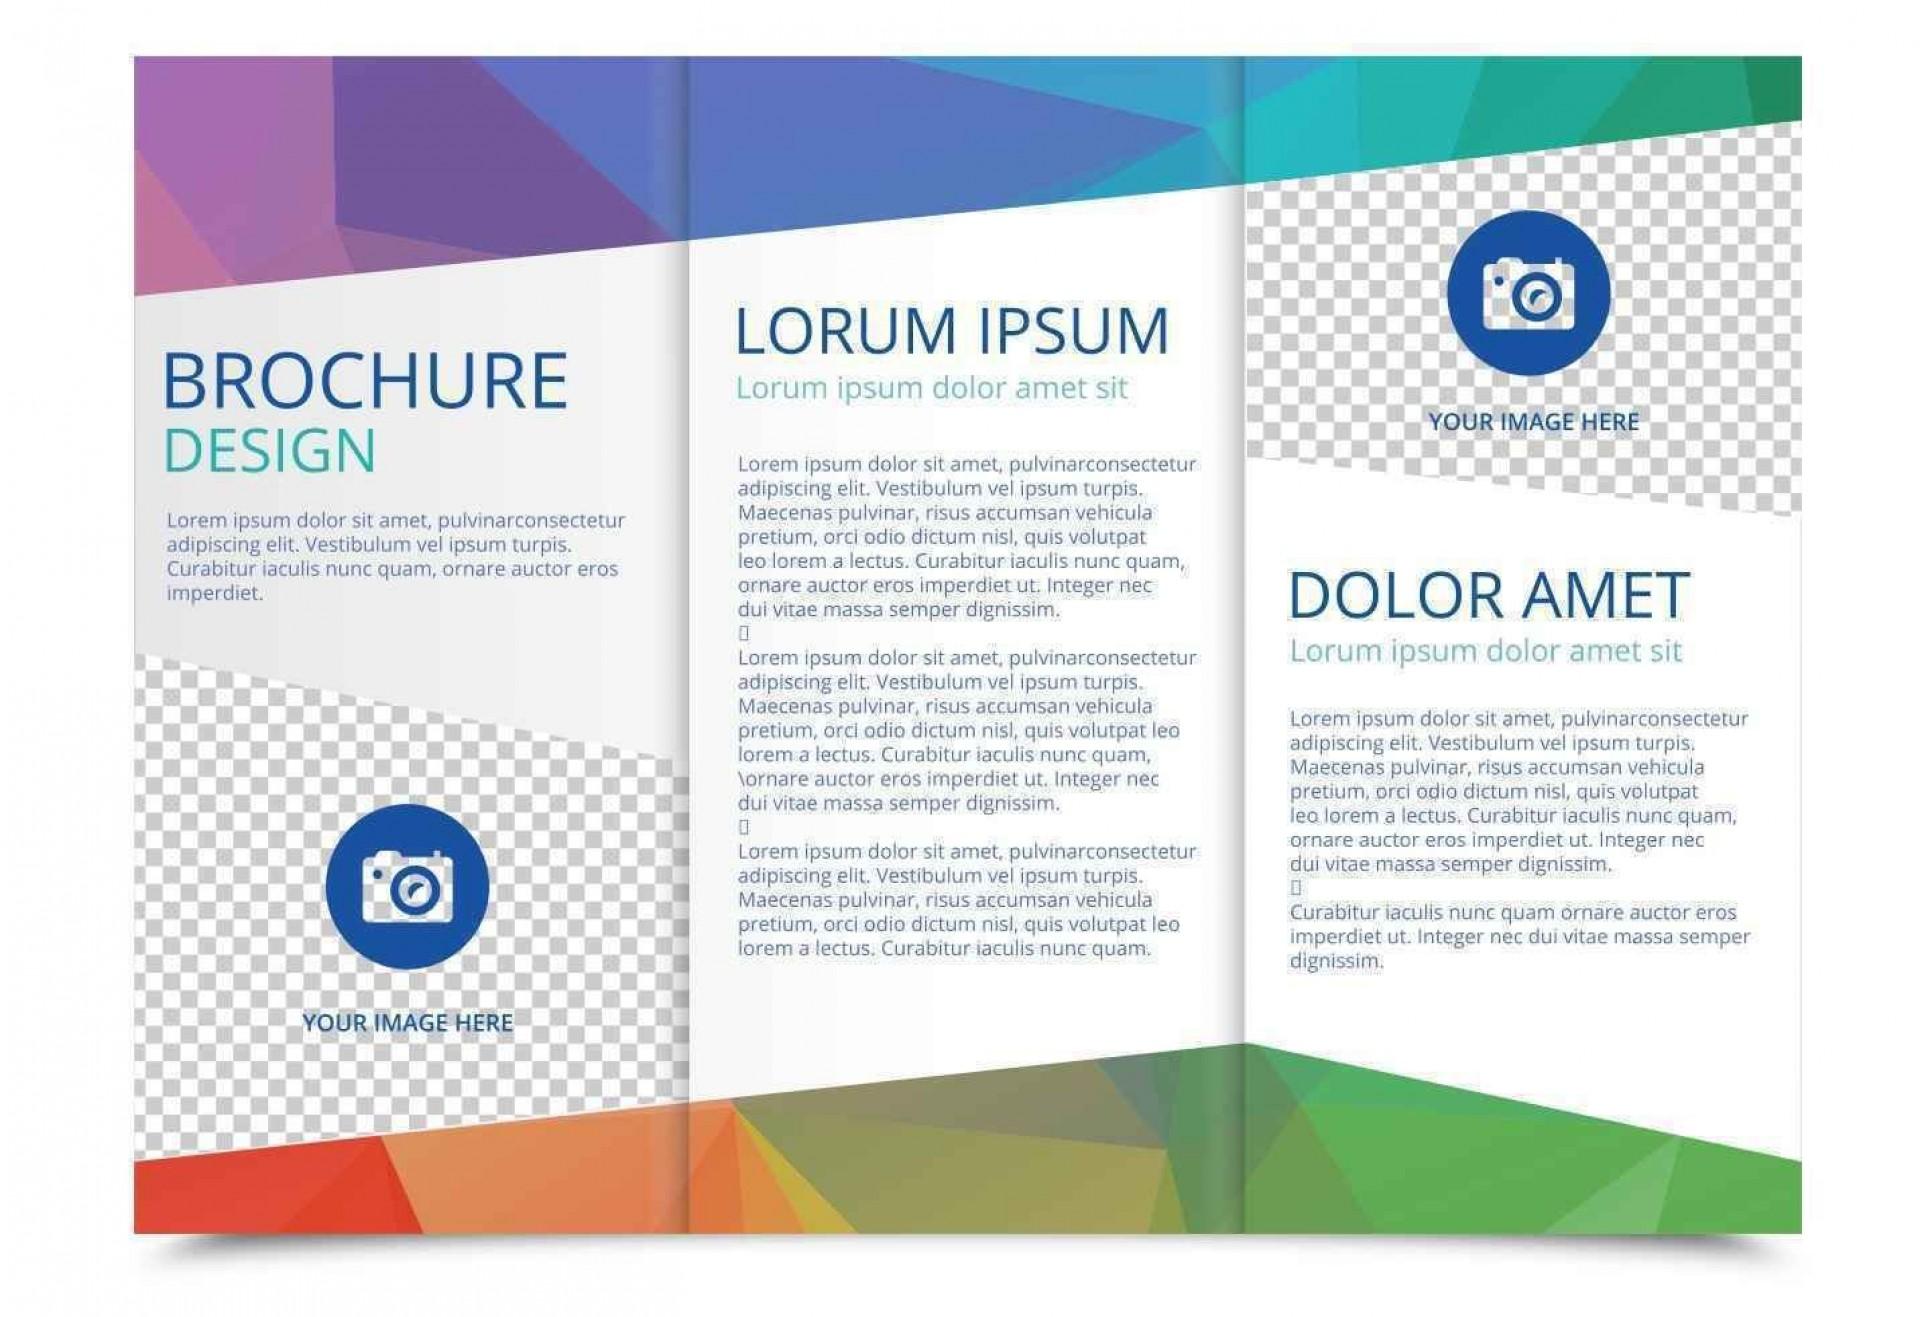 001 Formidable Tri Fold Brochure Template Word Sample  2010 2007 Free1920